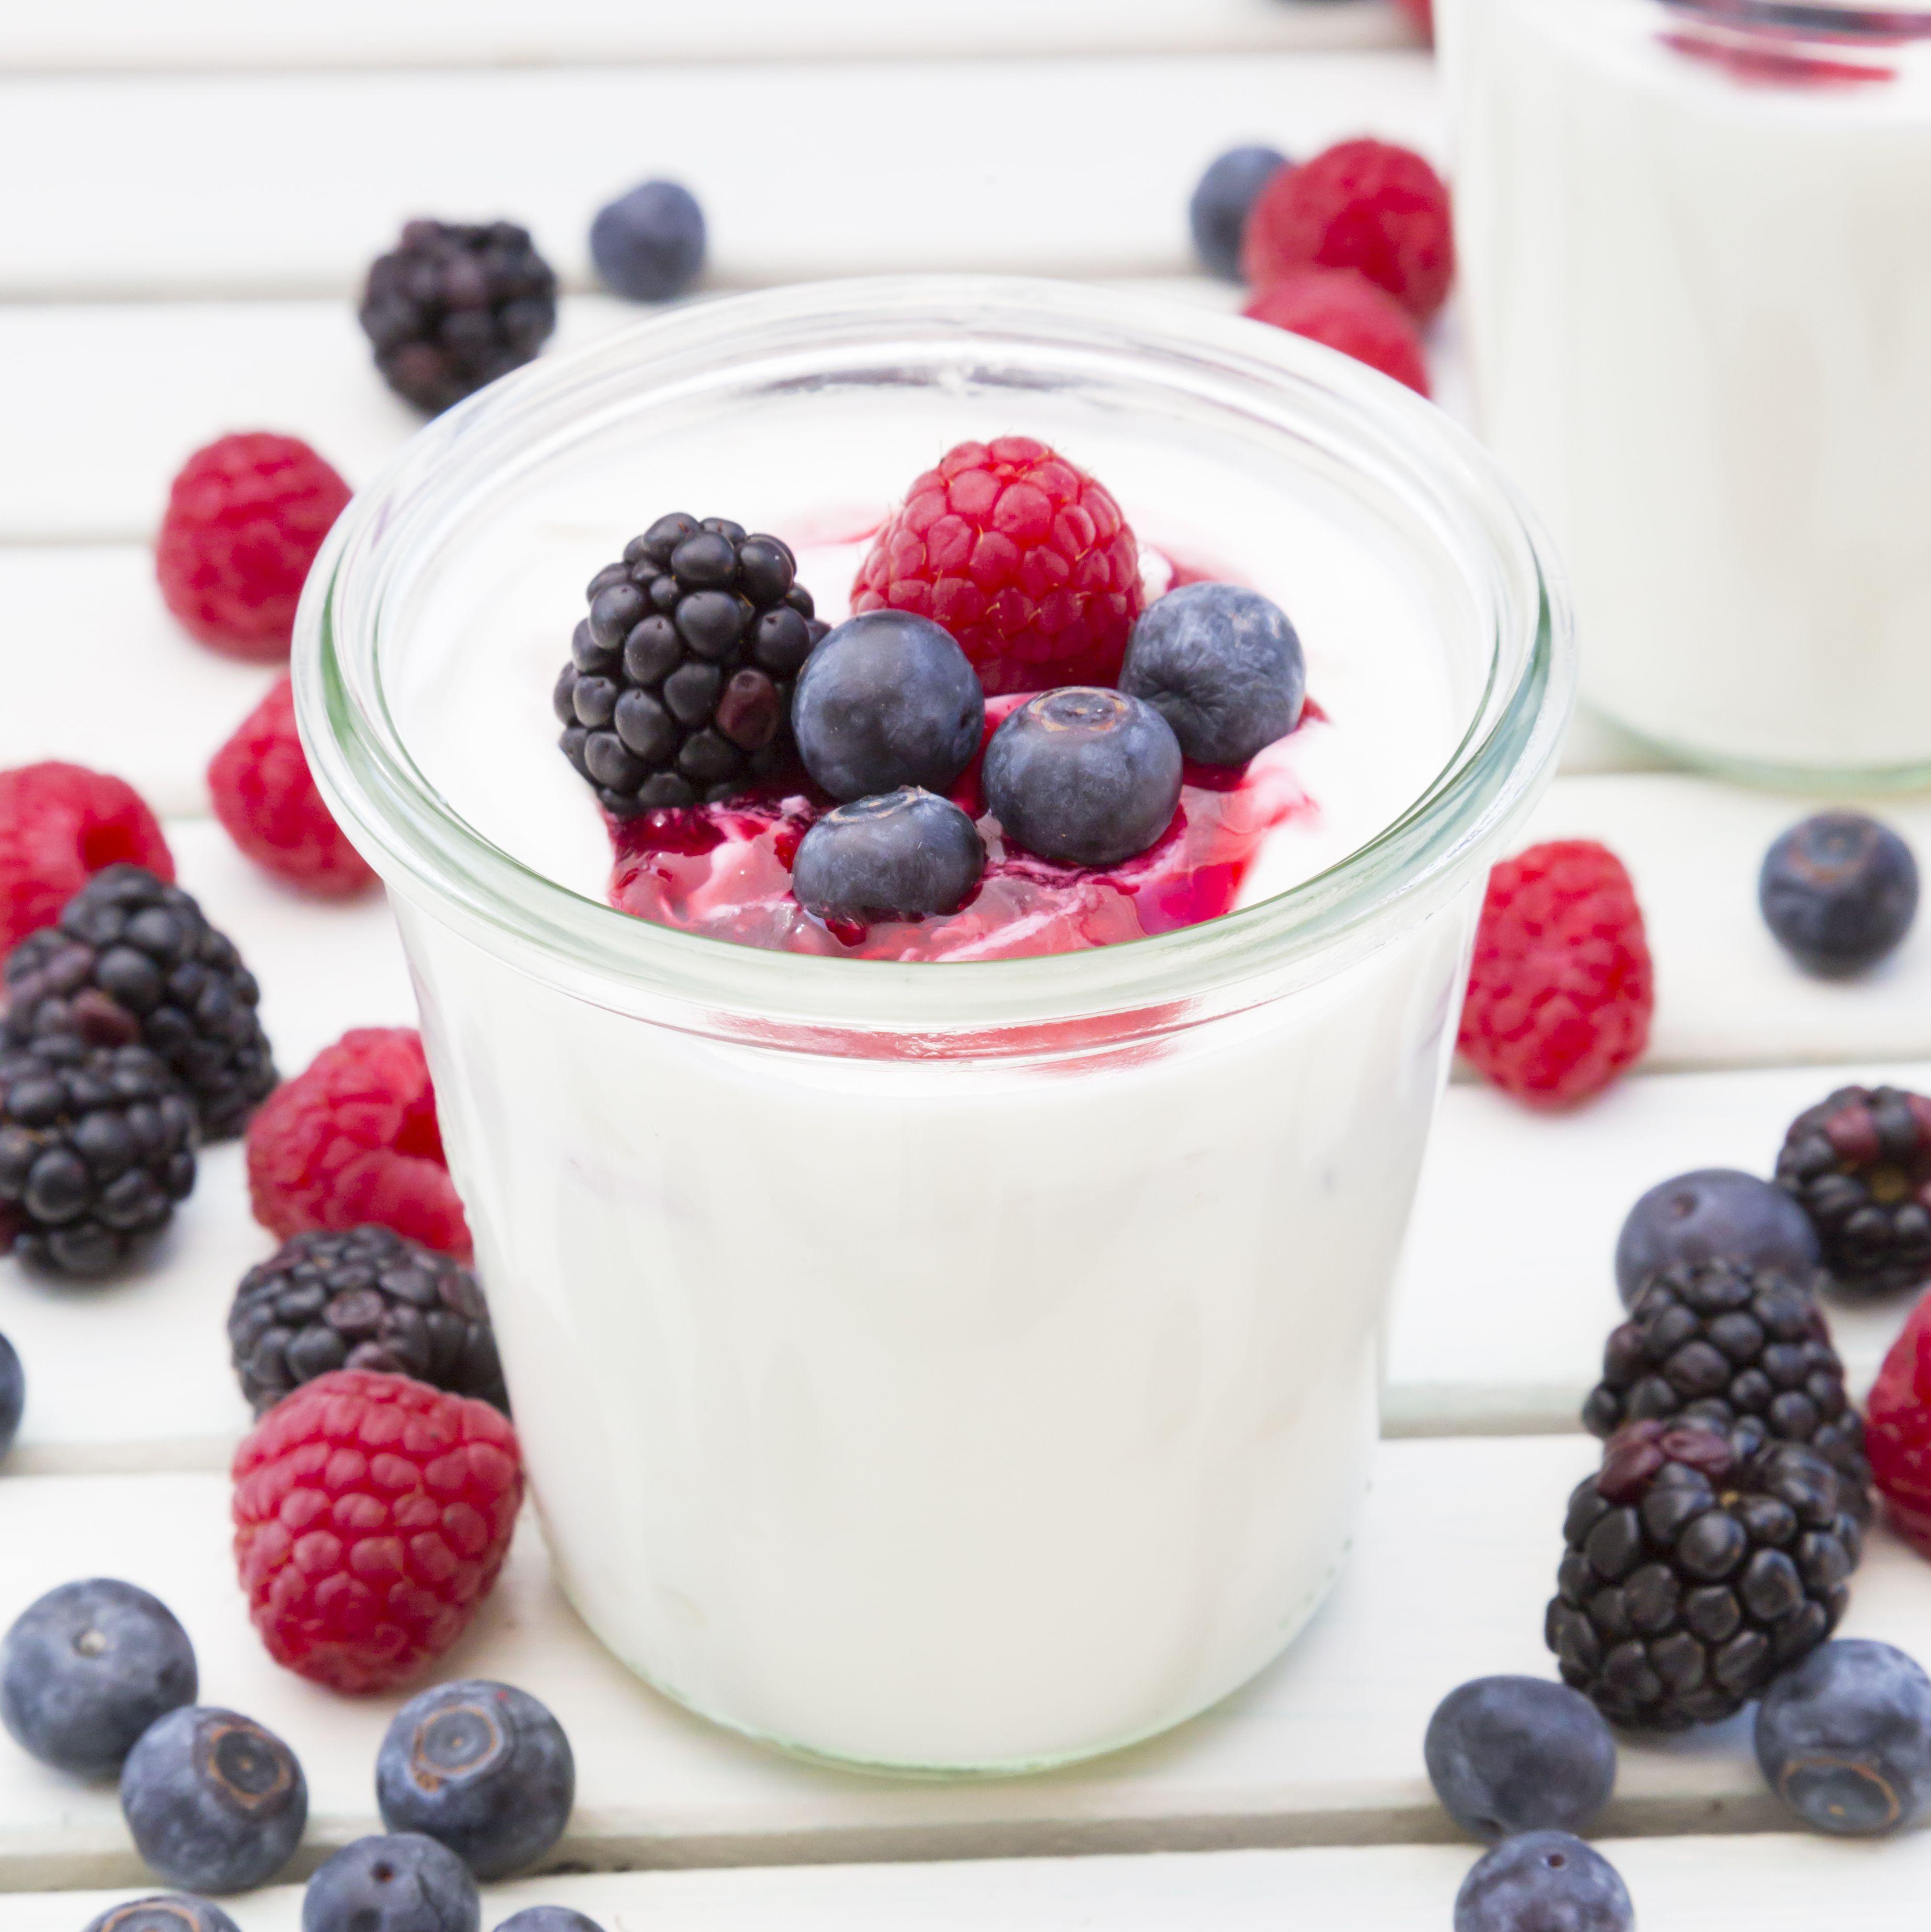 Glasses of Greek yogurt with berries